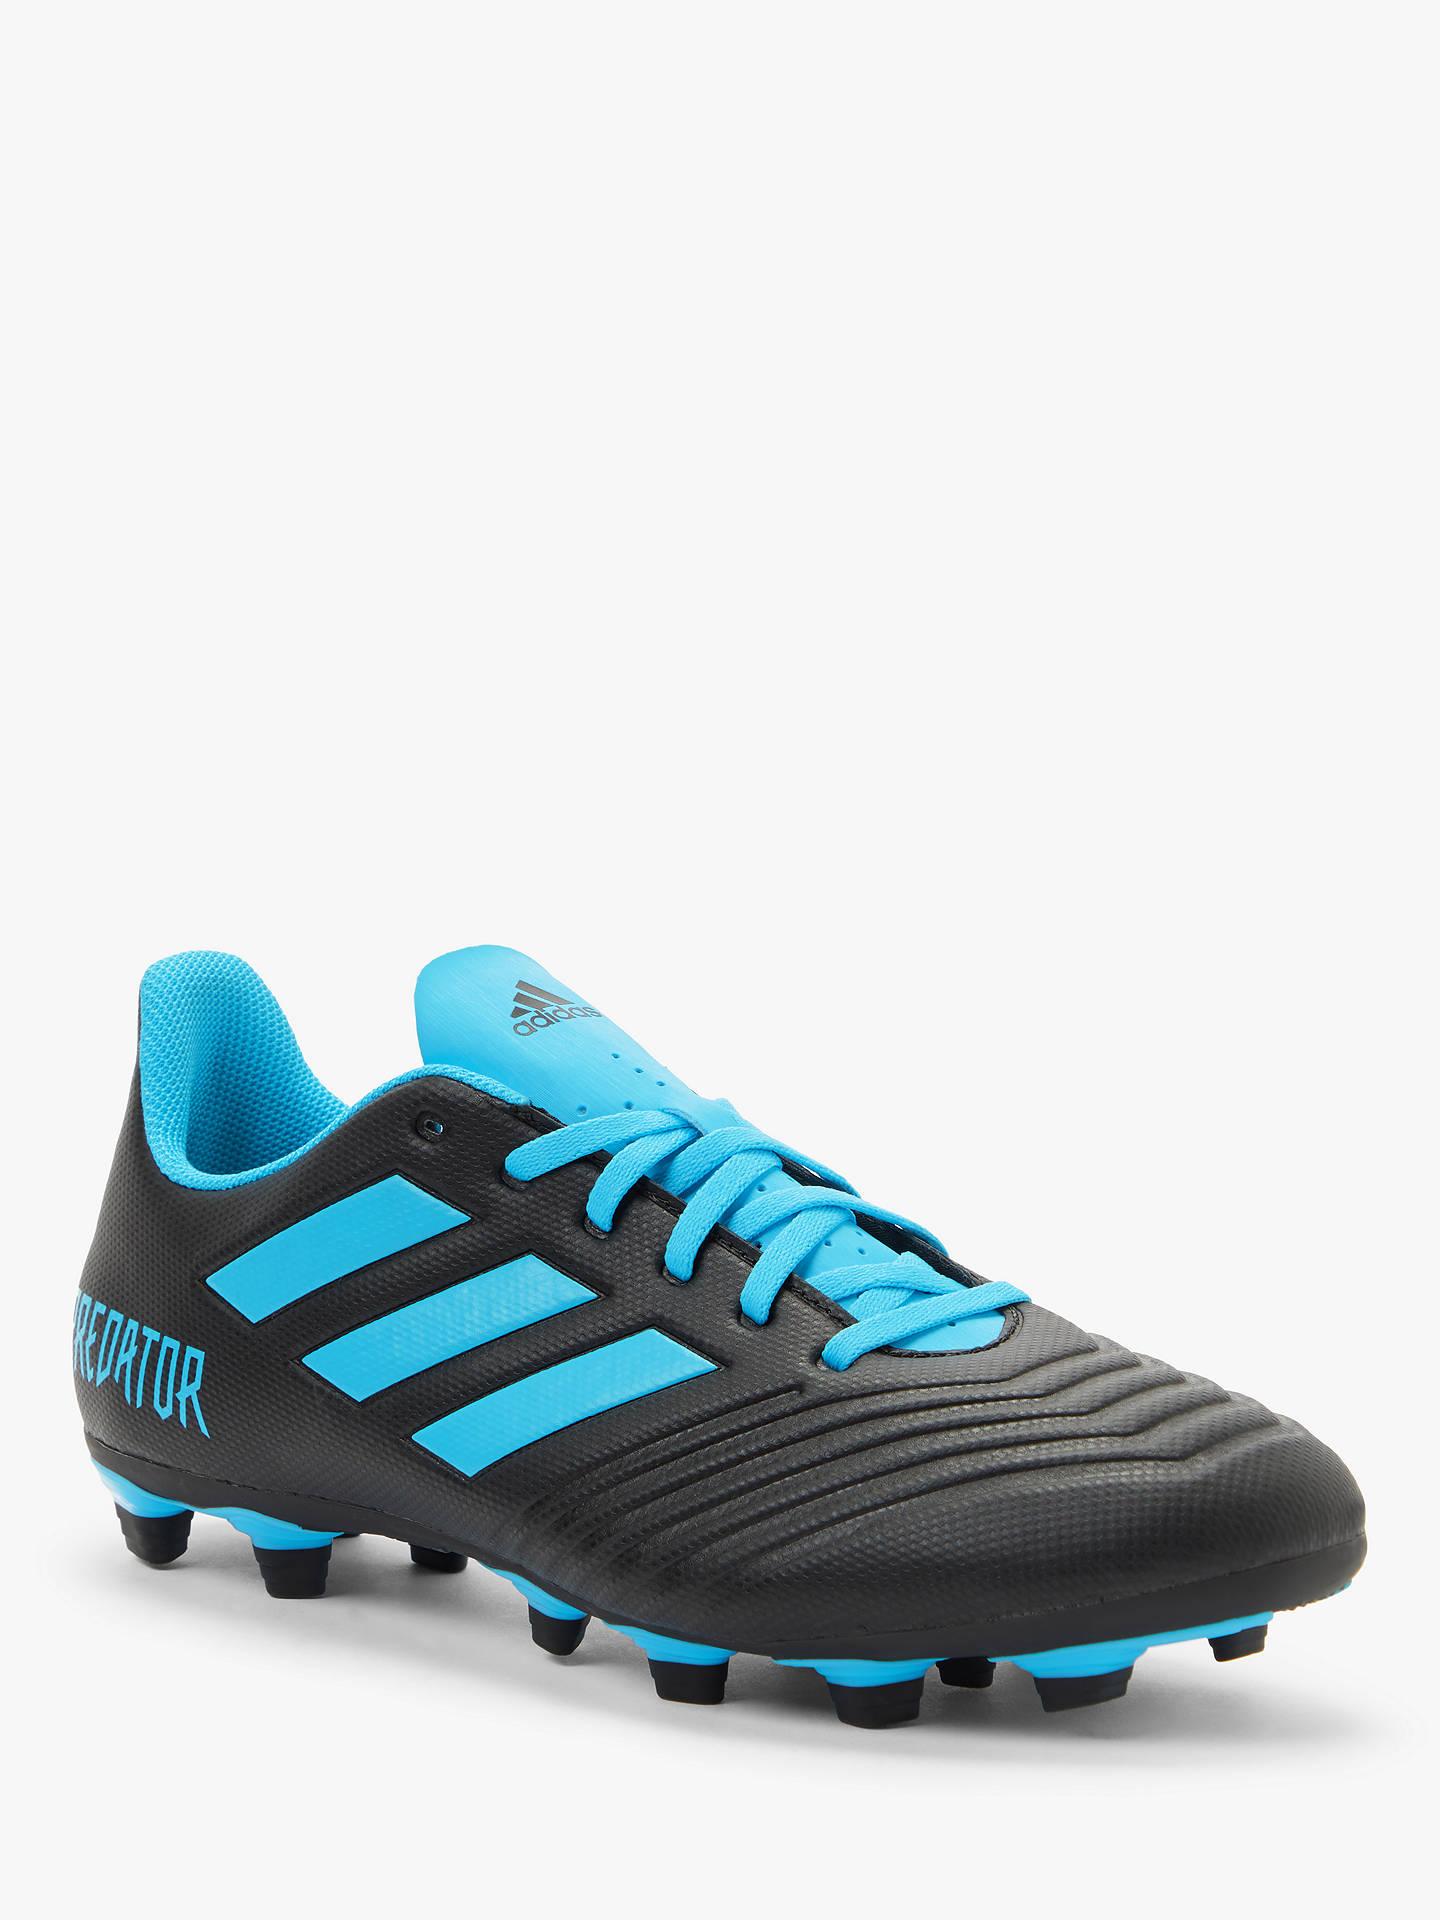 adidas Predator 19.4 FxG Firm Ground Kids Football Soccer Boot Dark Script